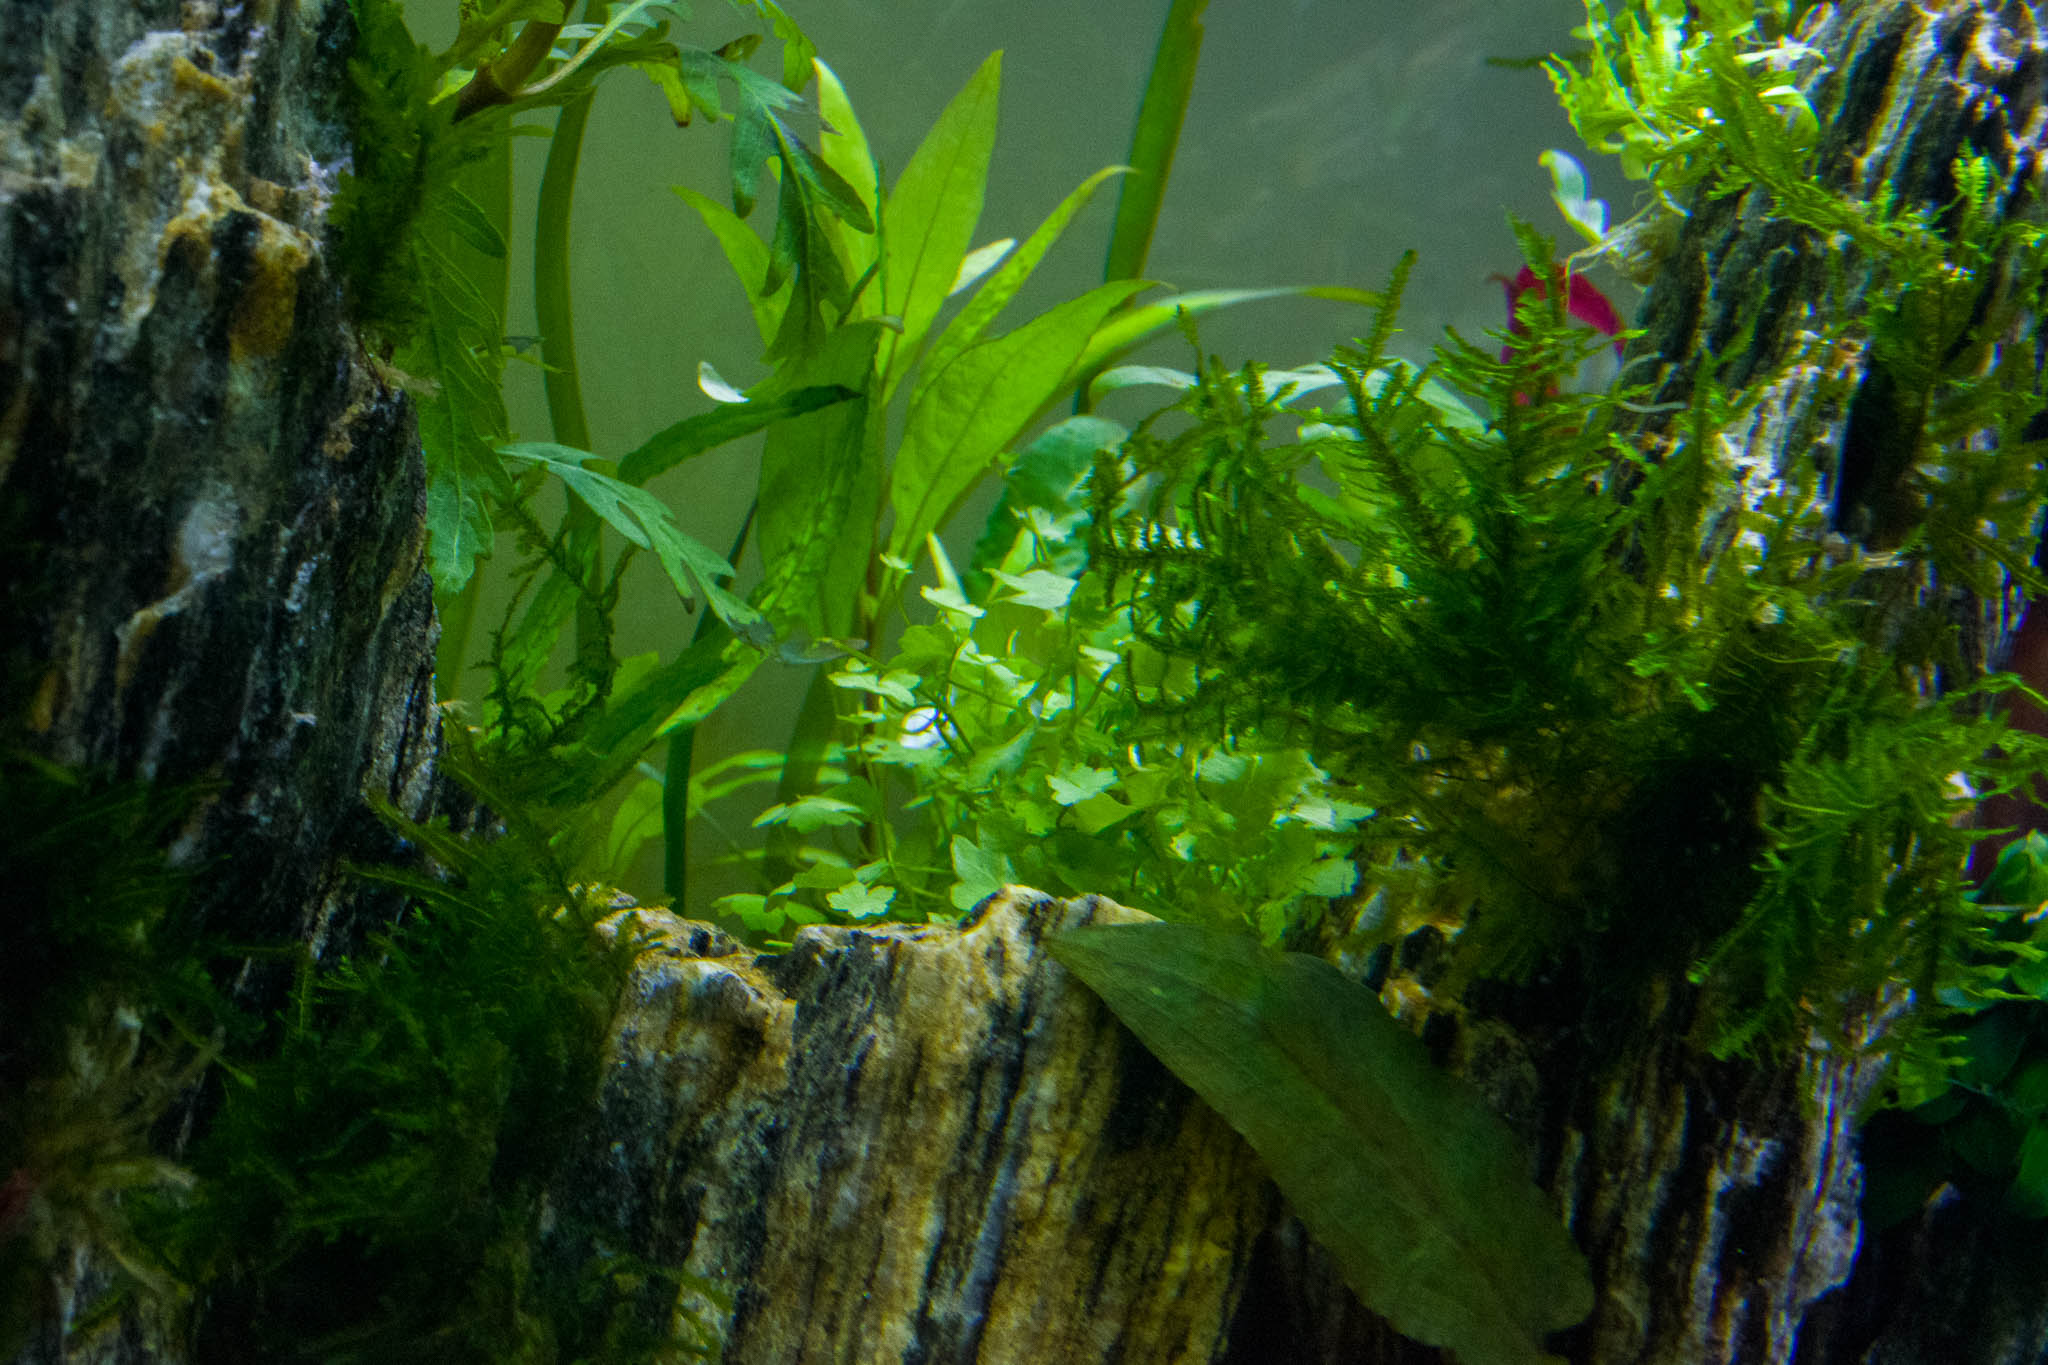 27th September- Hydrocotyle Tripartita and Spiky Moss_IMGP6600.jpg